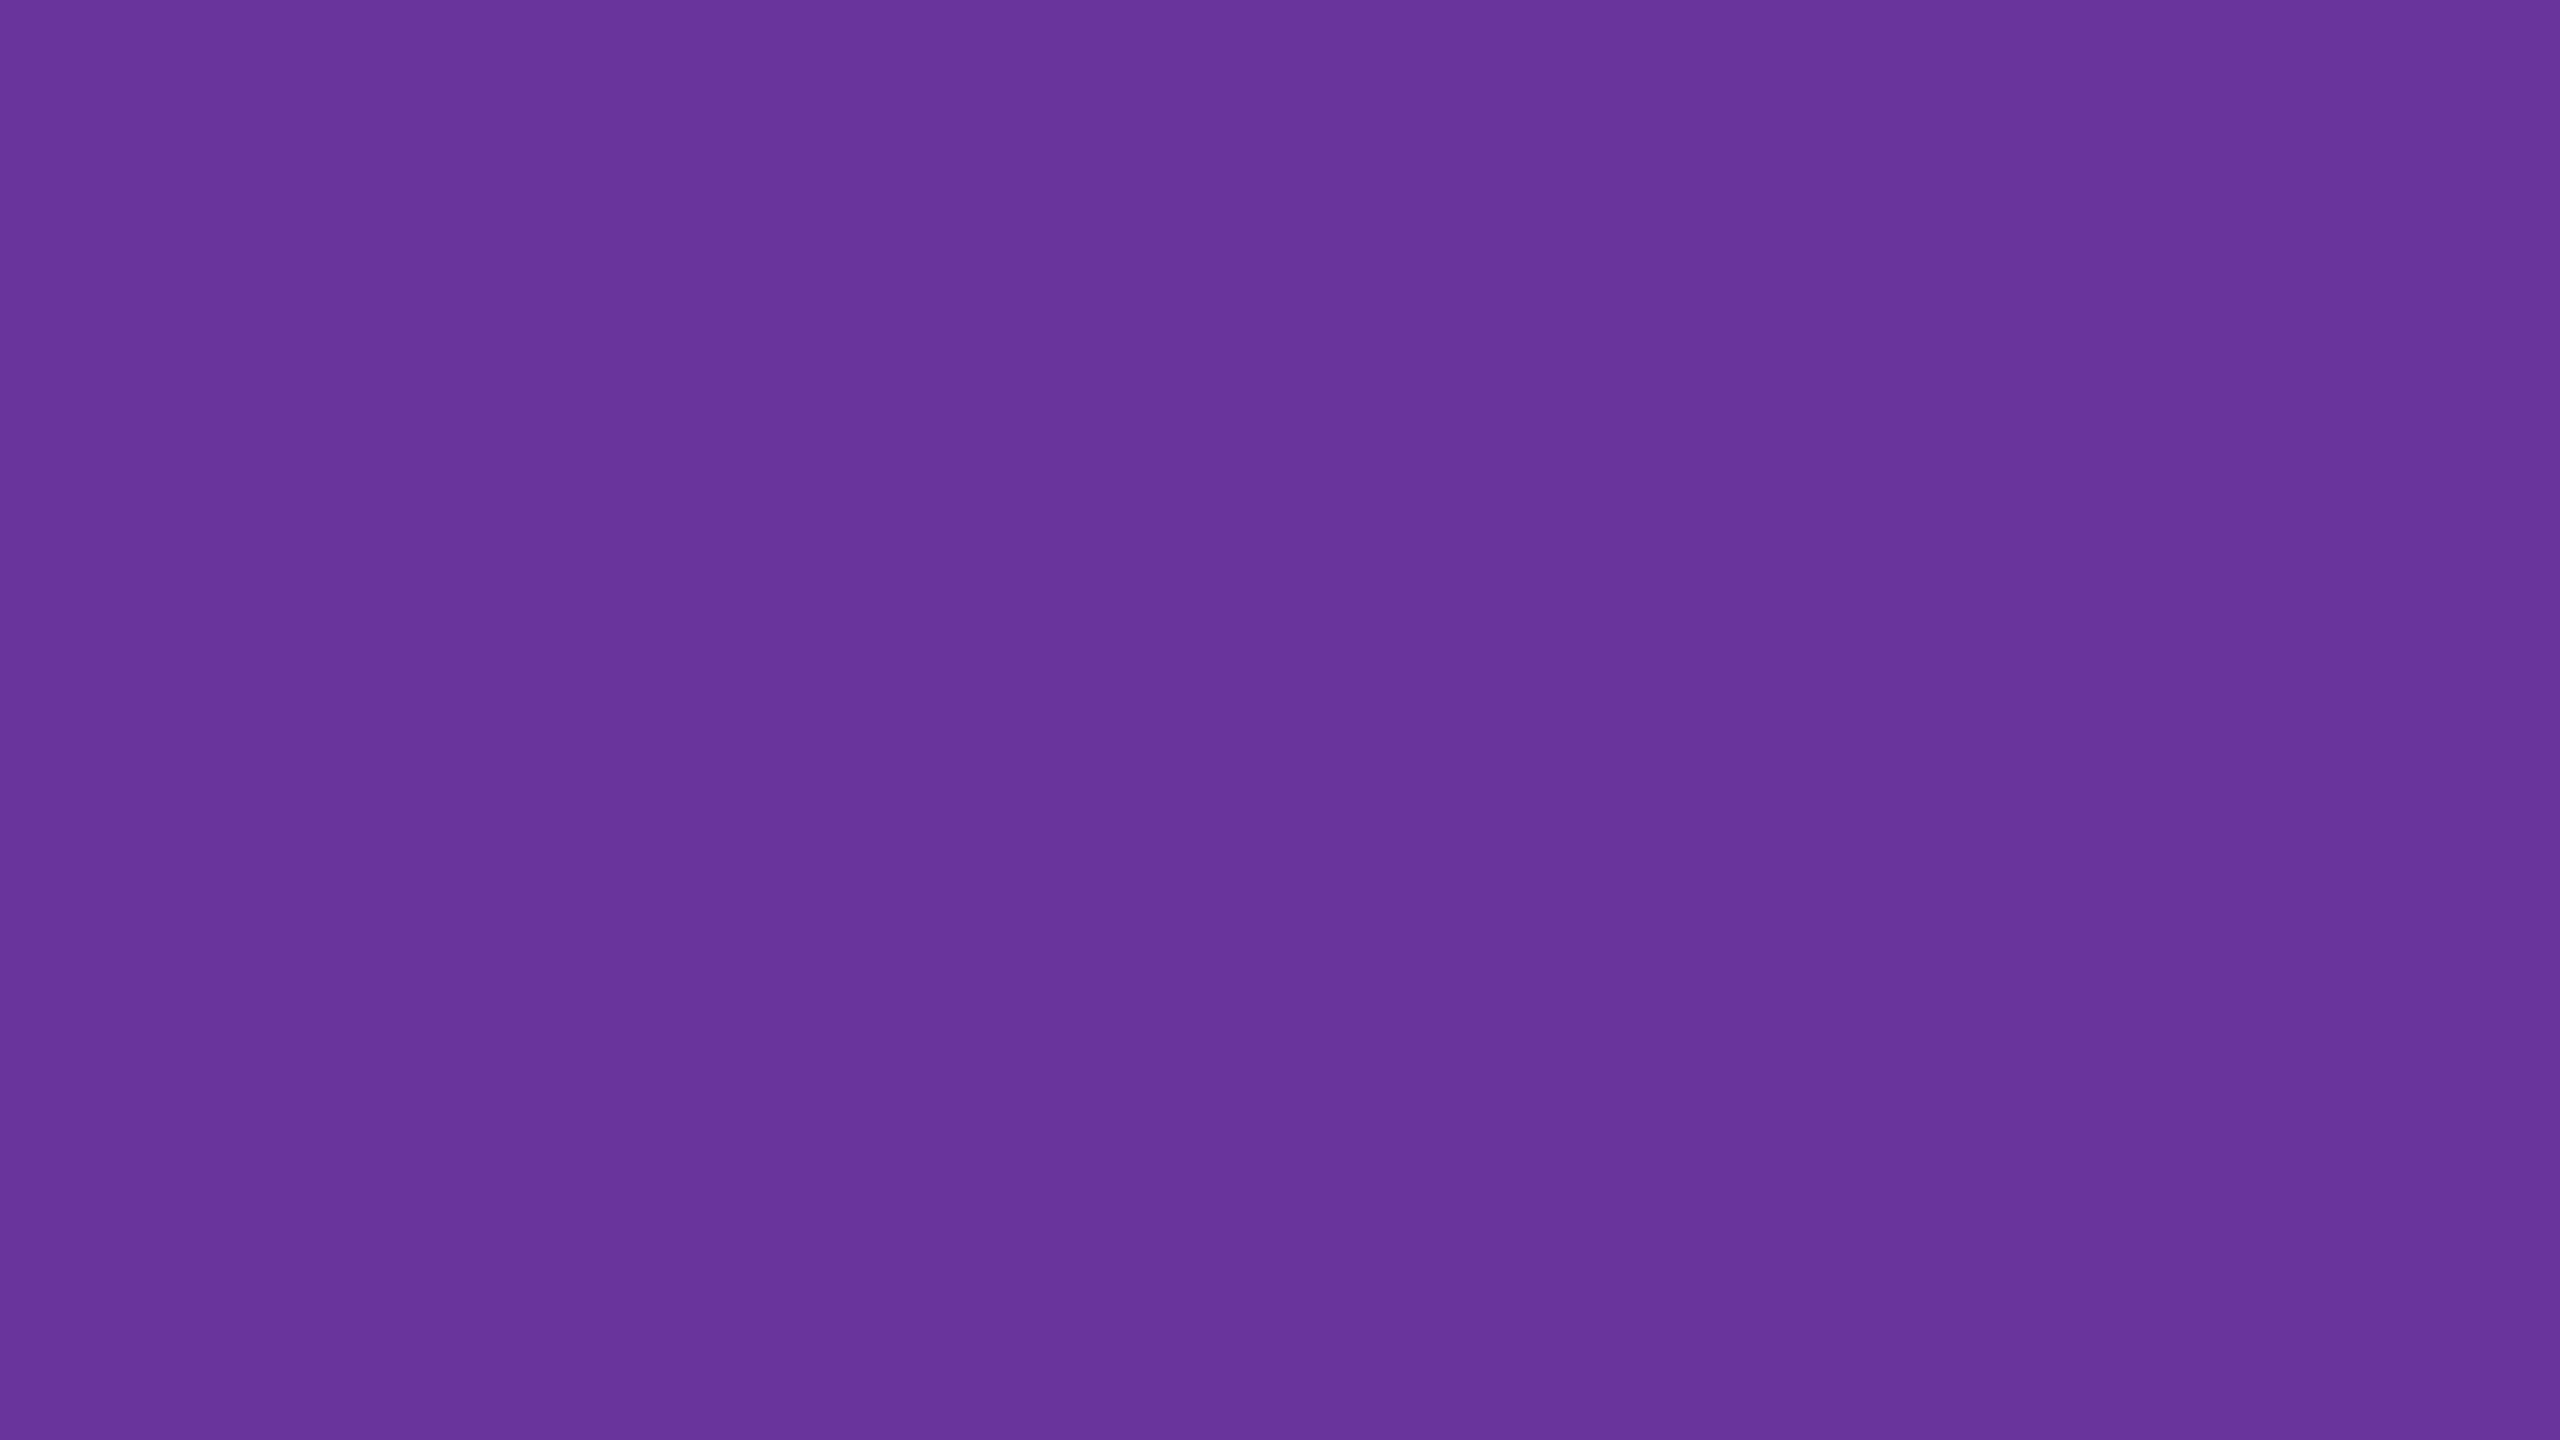 50+ Dark Solid Purple Wallpaper on WallpaperSafari